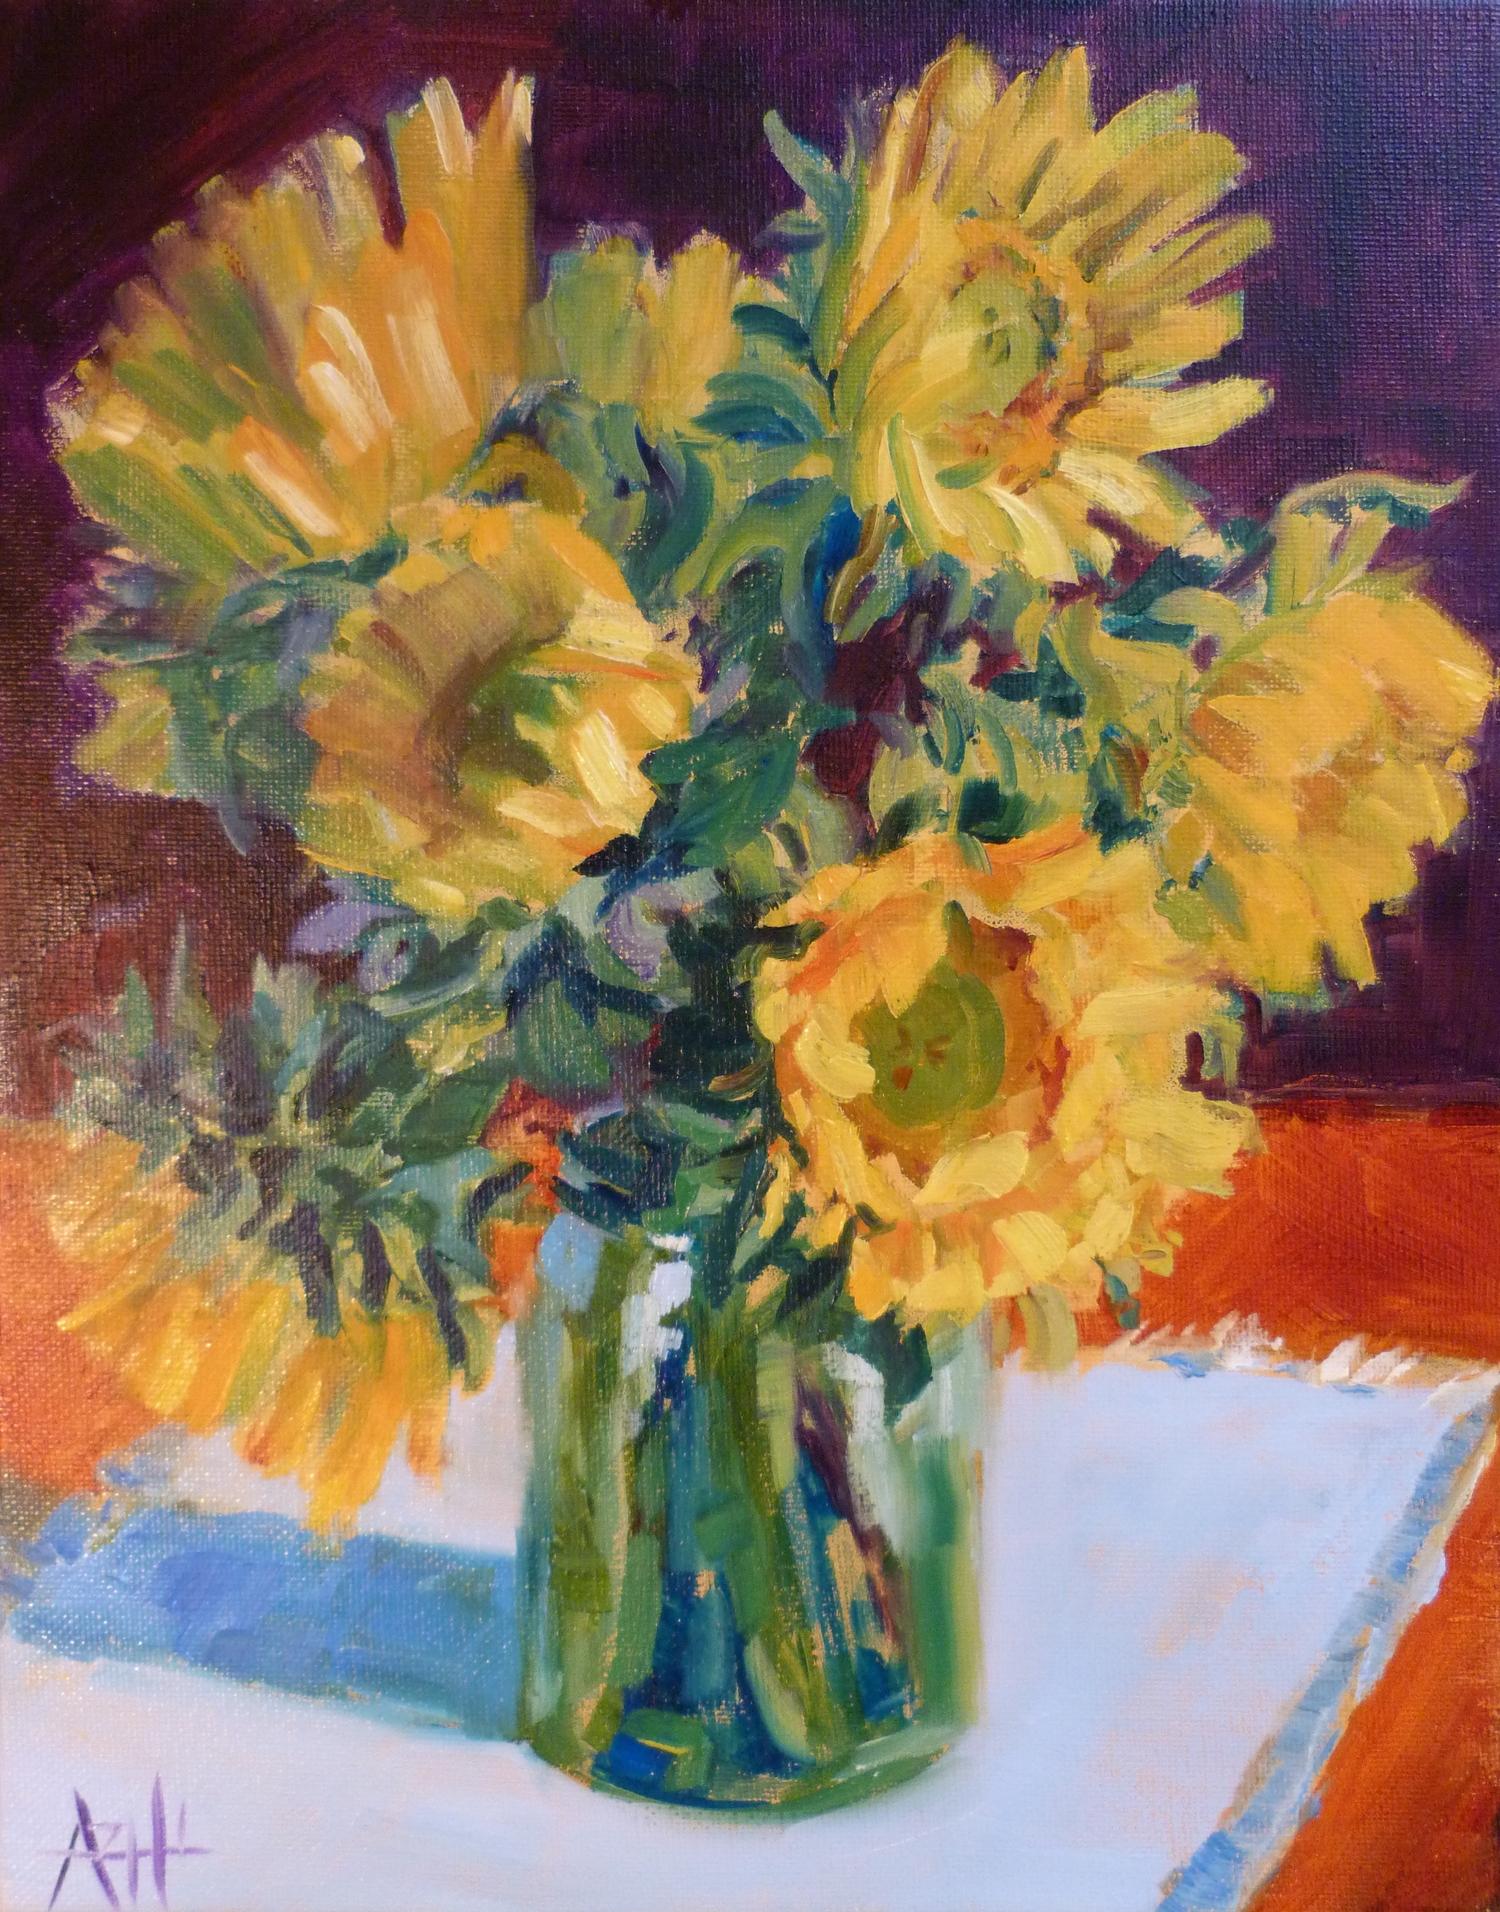 "SOLD, Sunflowers in a Jar, Copyright 2014 Hirschten, Oil on Canvas, 11"" x 14"""